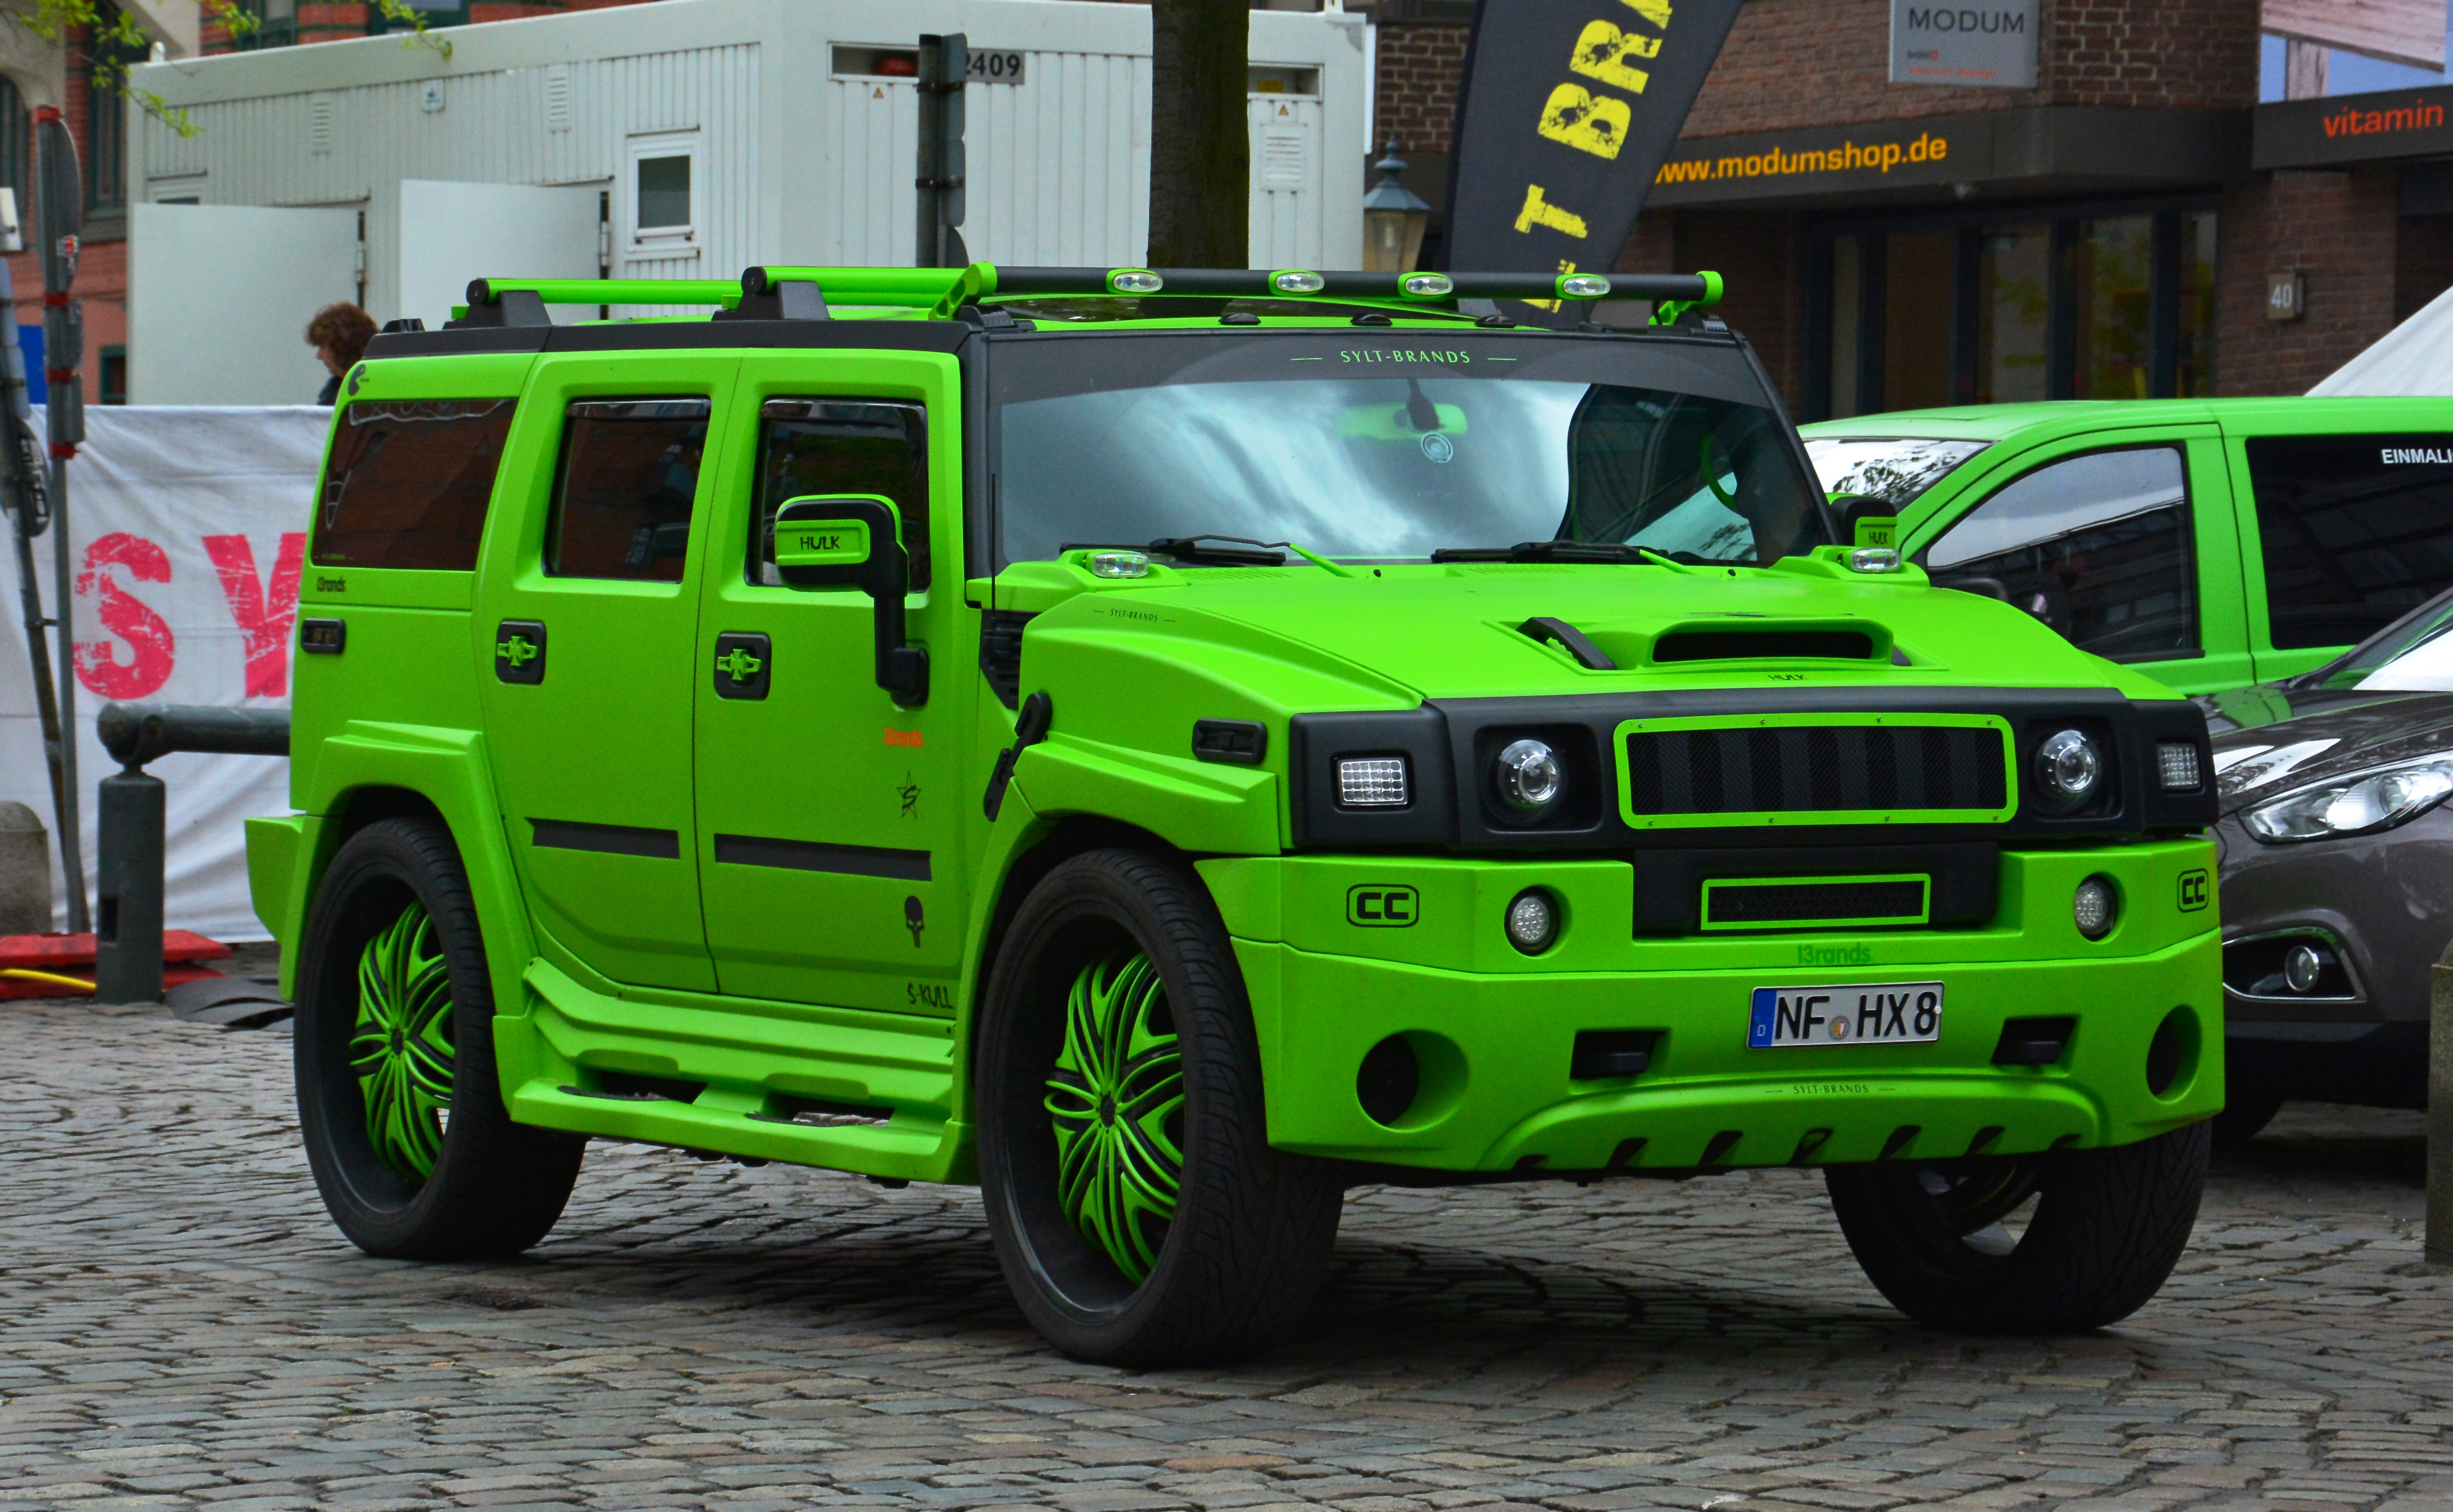 Hummer H4 Inside >> File:Hummer H2 – 825. Hamburger Hafengeburtstag 2014 02.jpg - Wikimedia Commons